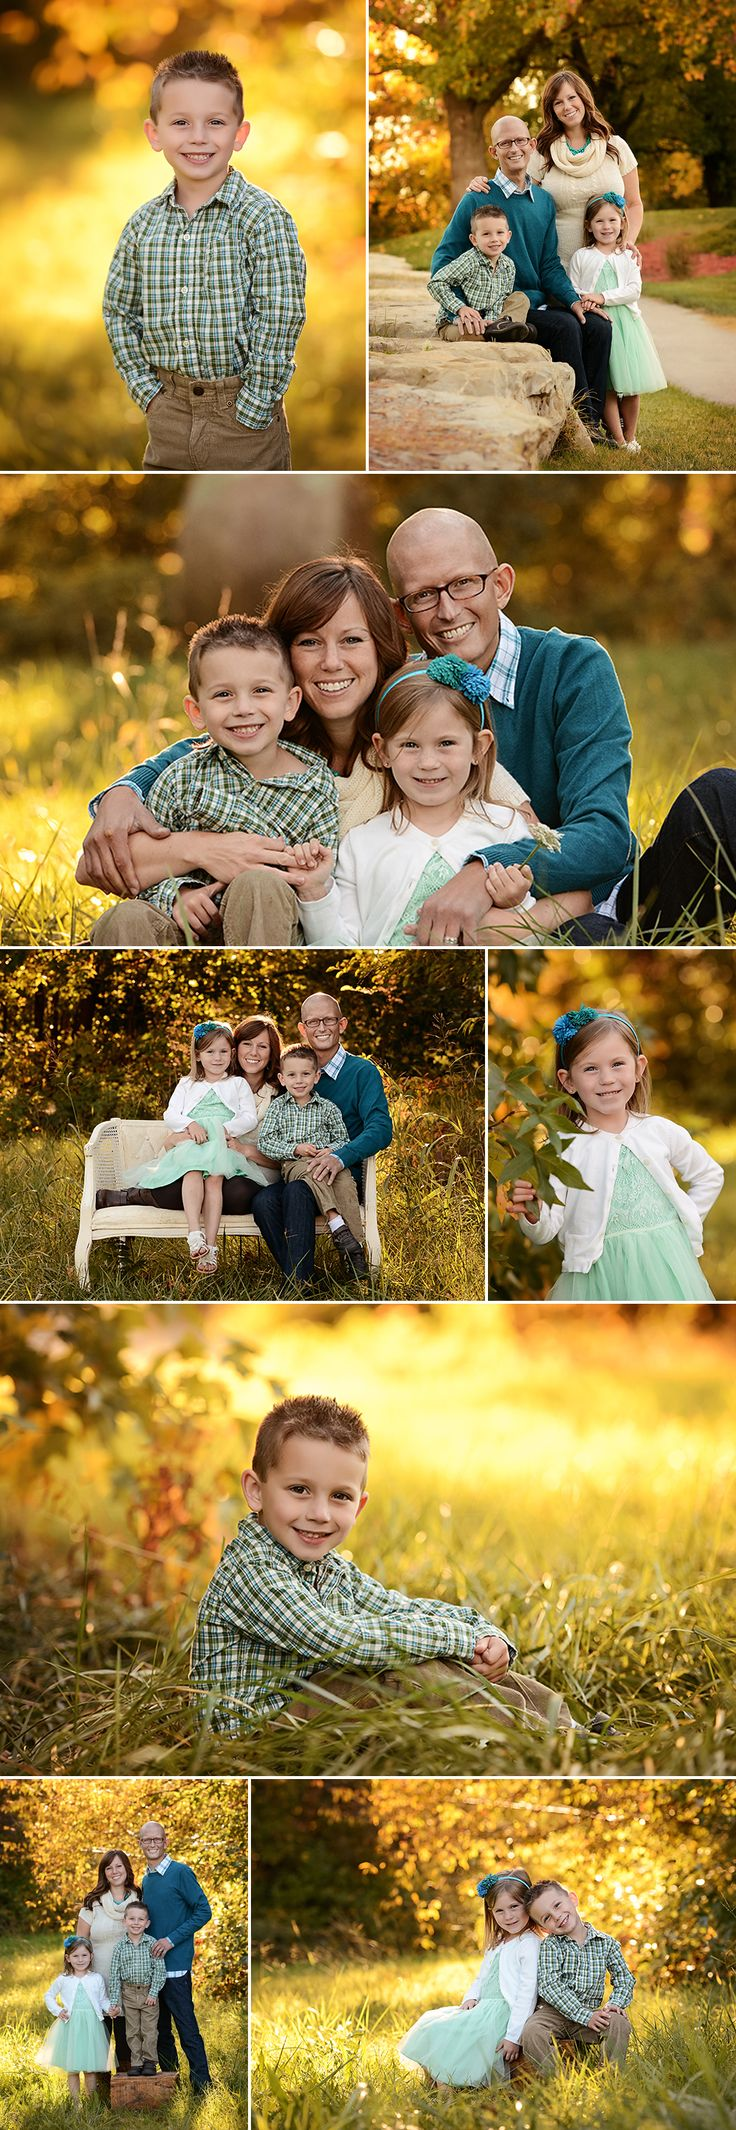 Swade Studios www.swadestudiosphotography.com Kansas City Family Photographer, Overland Park, Lenexa, Olathe, outdoor family photos, fall family photos, park family photos, best family poses, natural family poses.